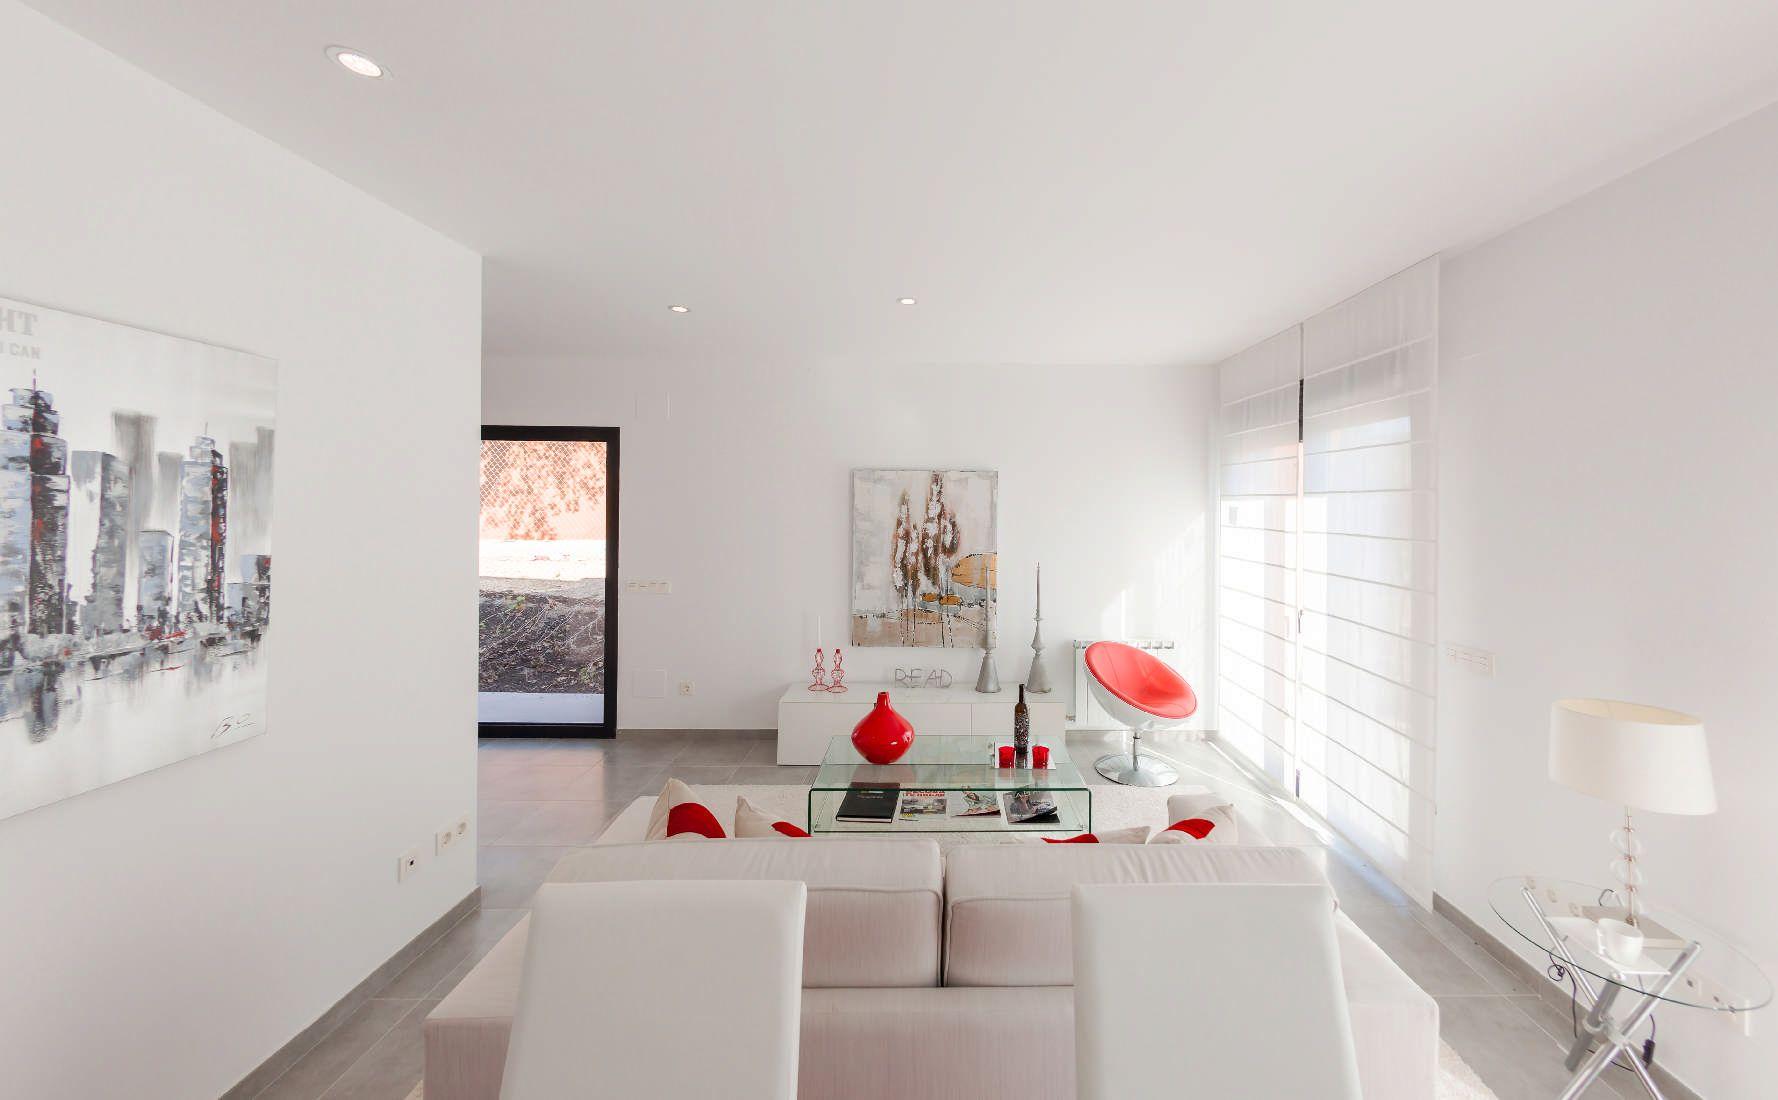 Casa Violeta - img 7.